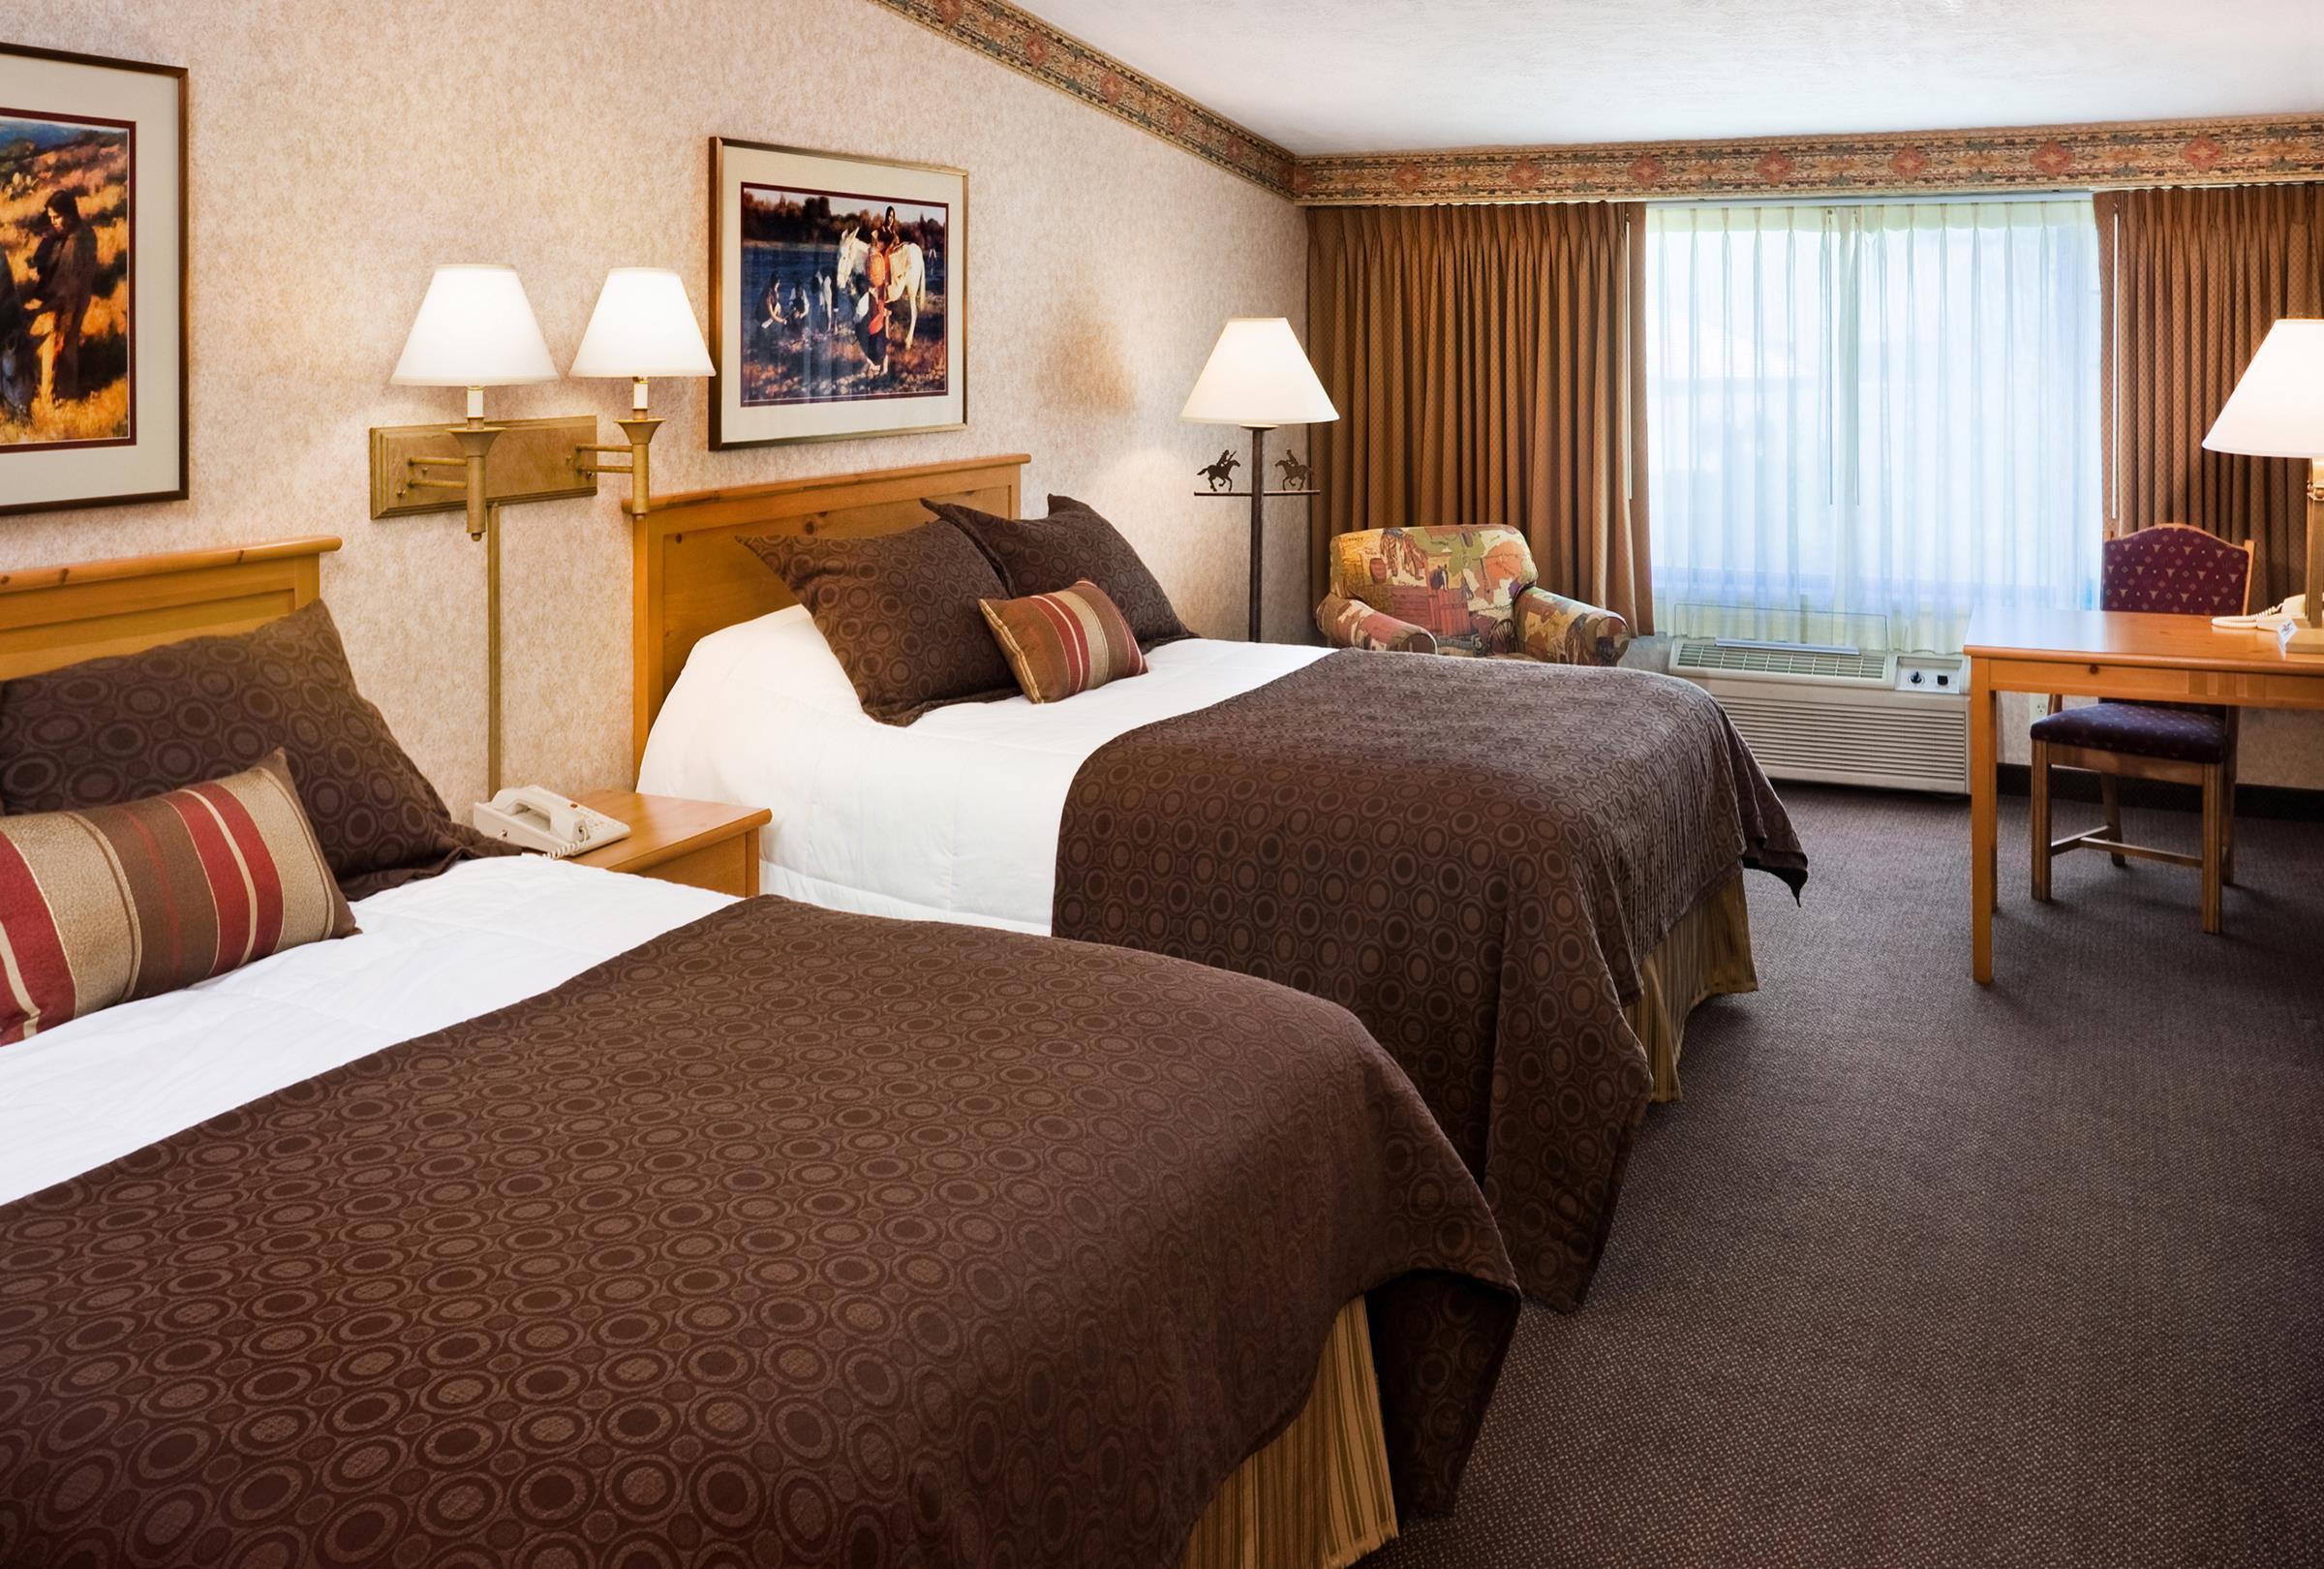 Best Western Ramkota Hotel image 14